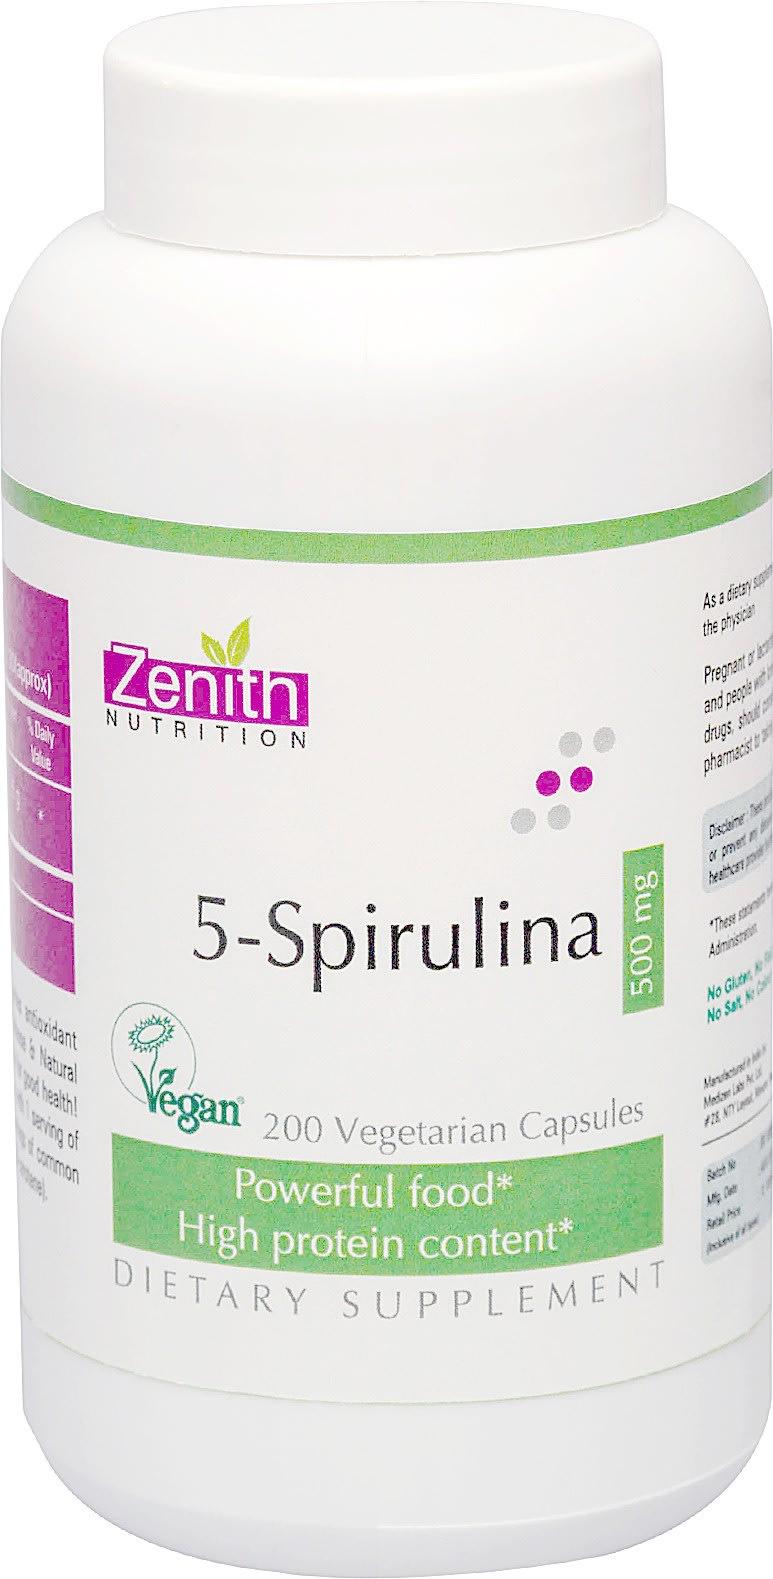 Zenith Nutrition  5-Spirulina 500mg Capsule